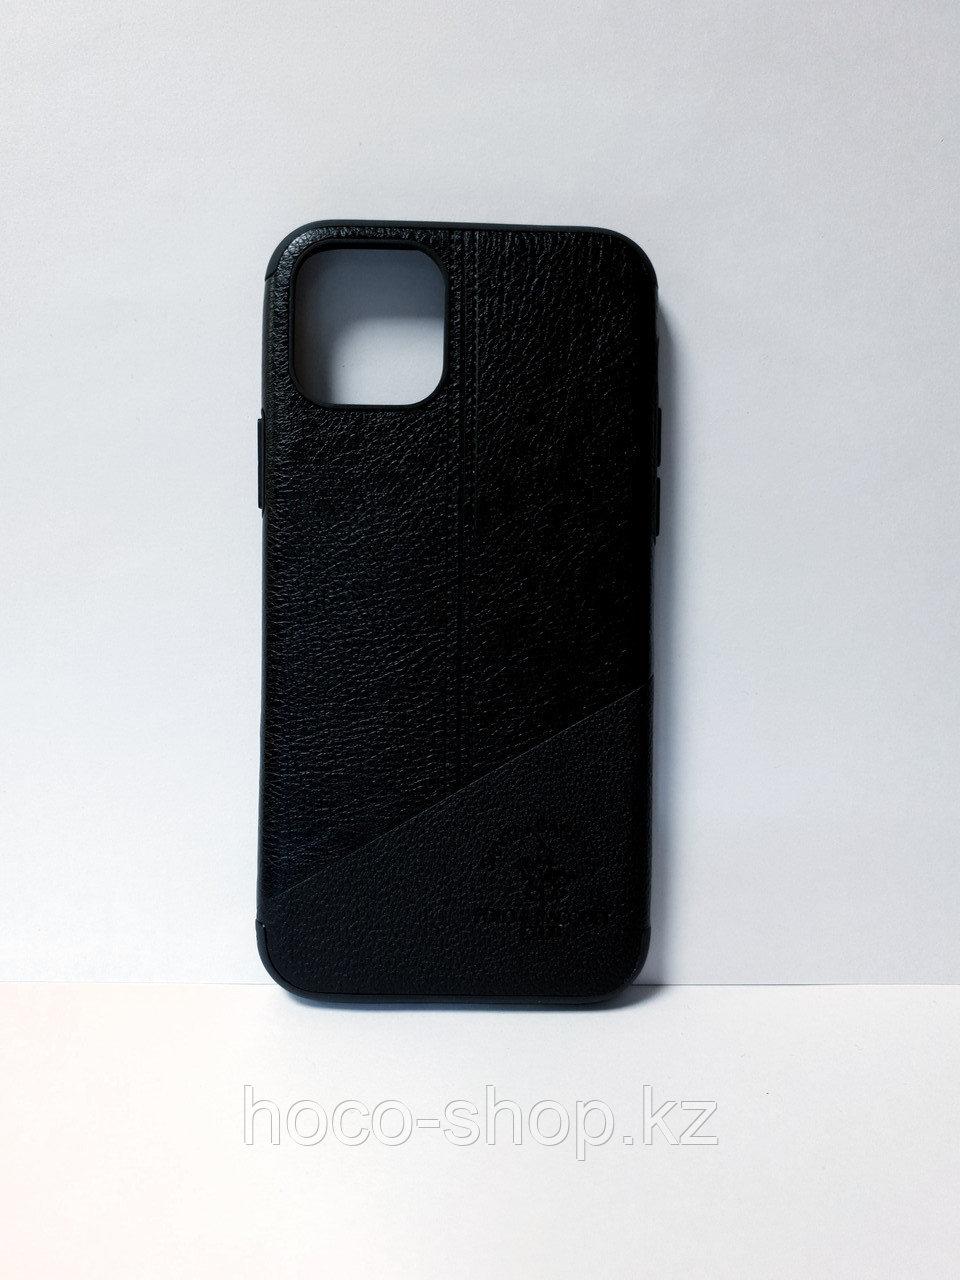 Чехол гелевый под кожу iPhone 11 Pro